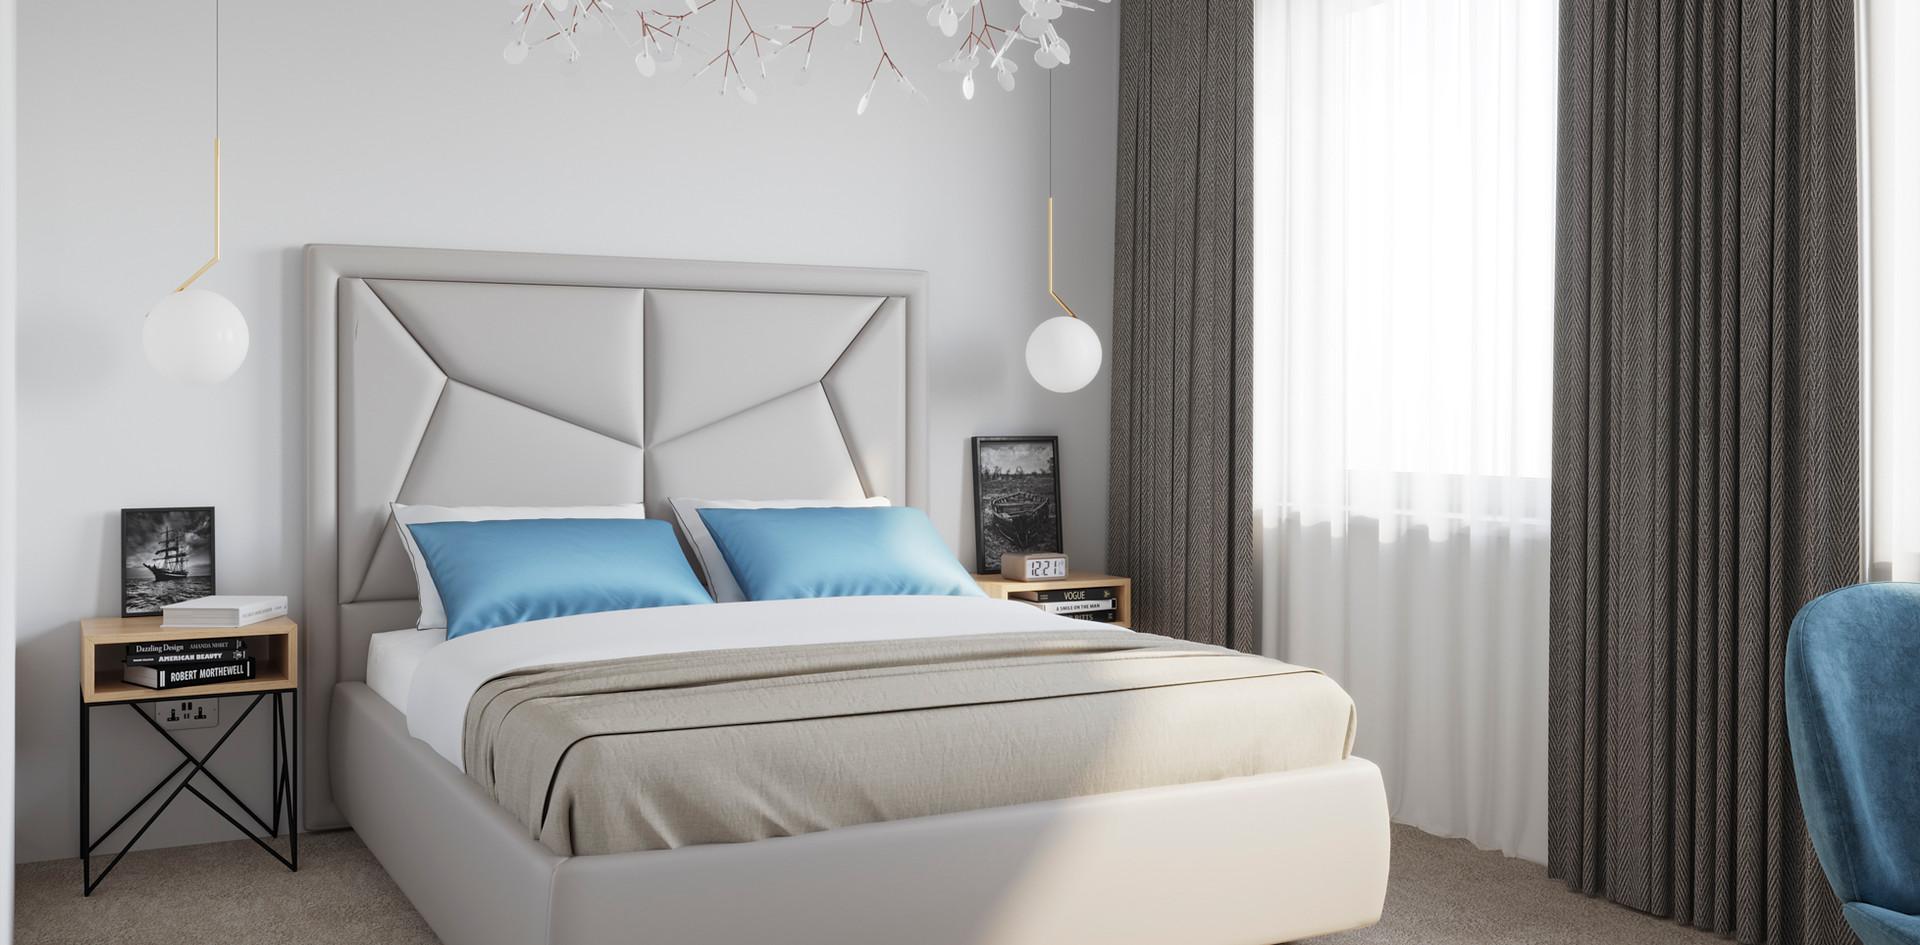 Bedroom4_1.JPG